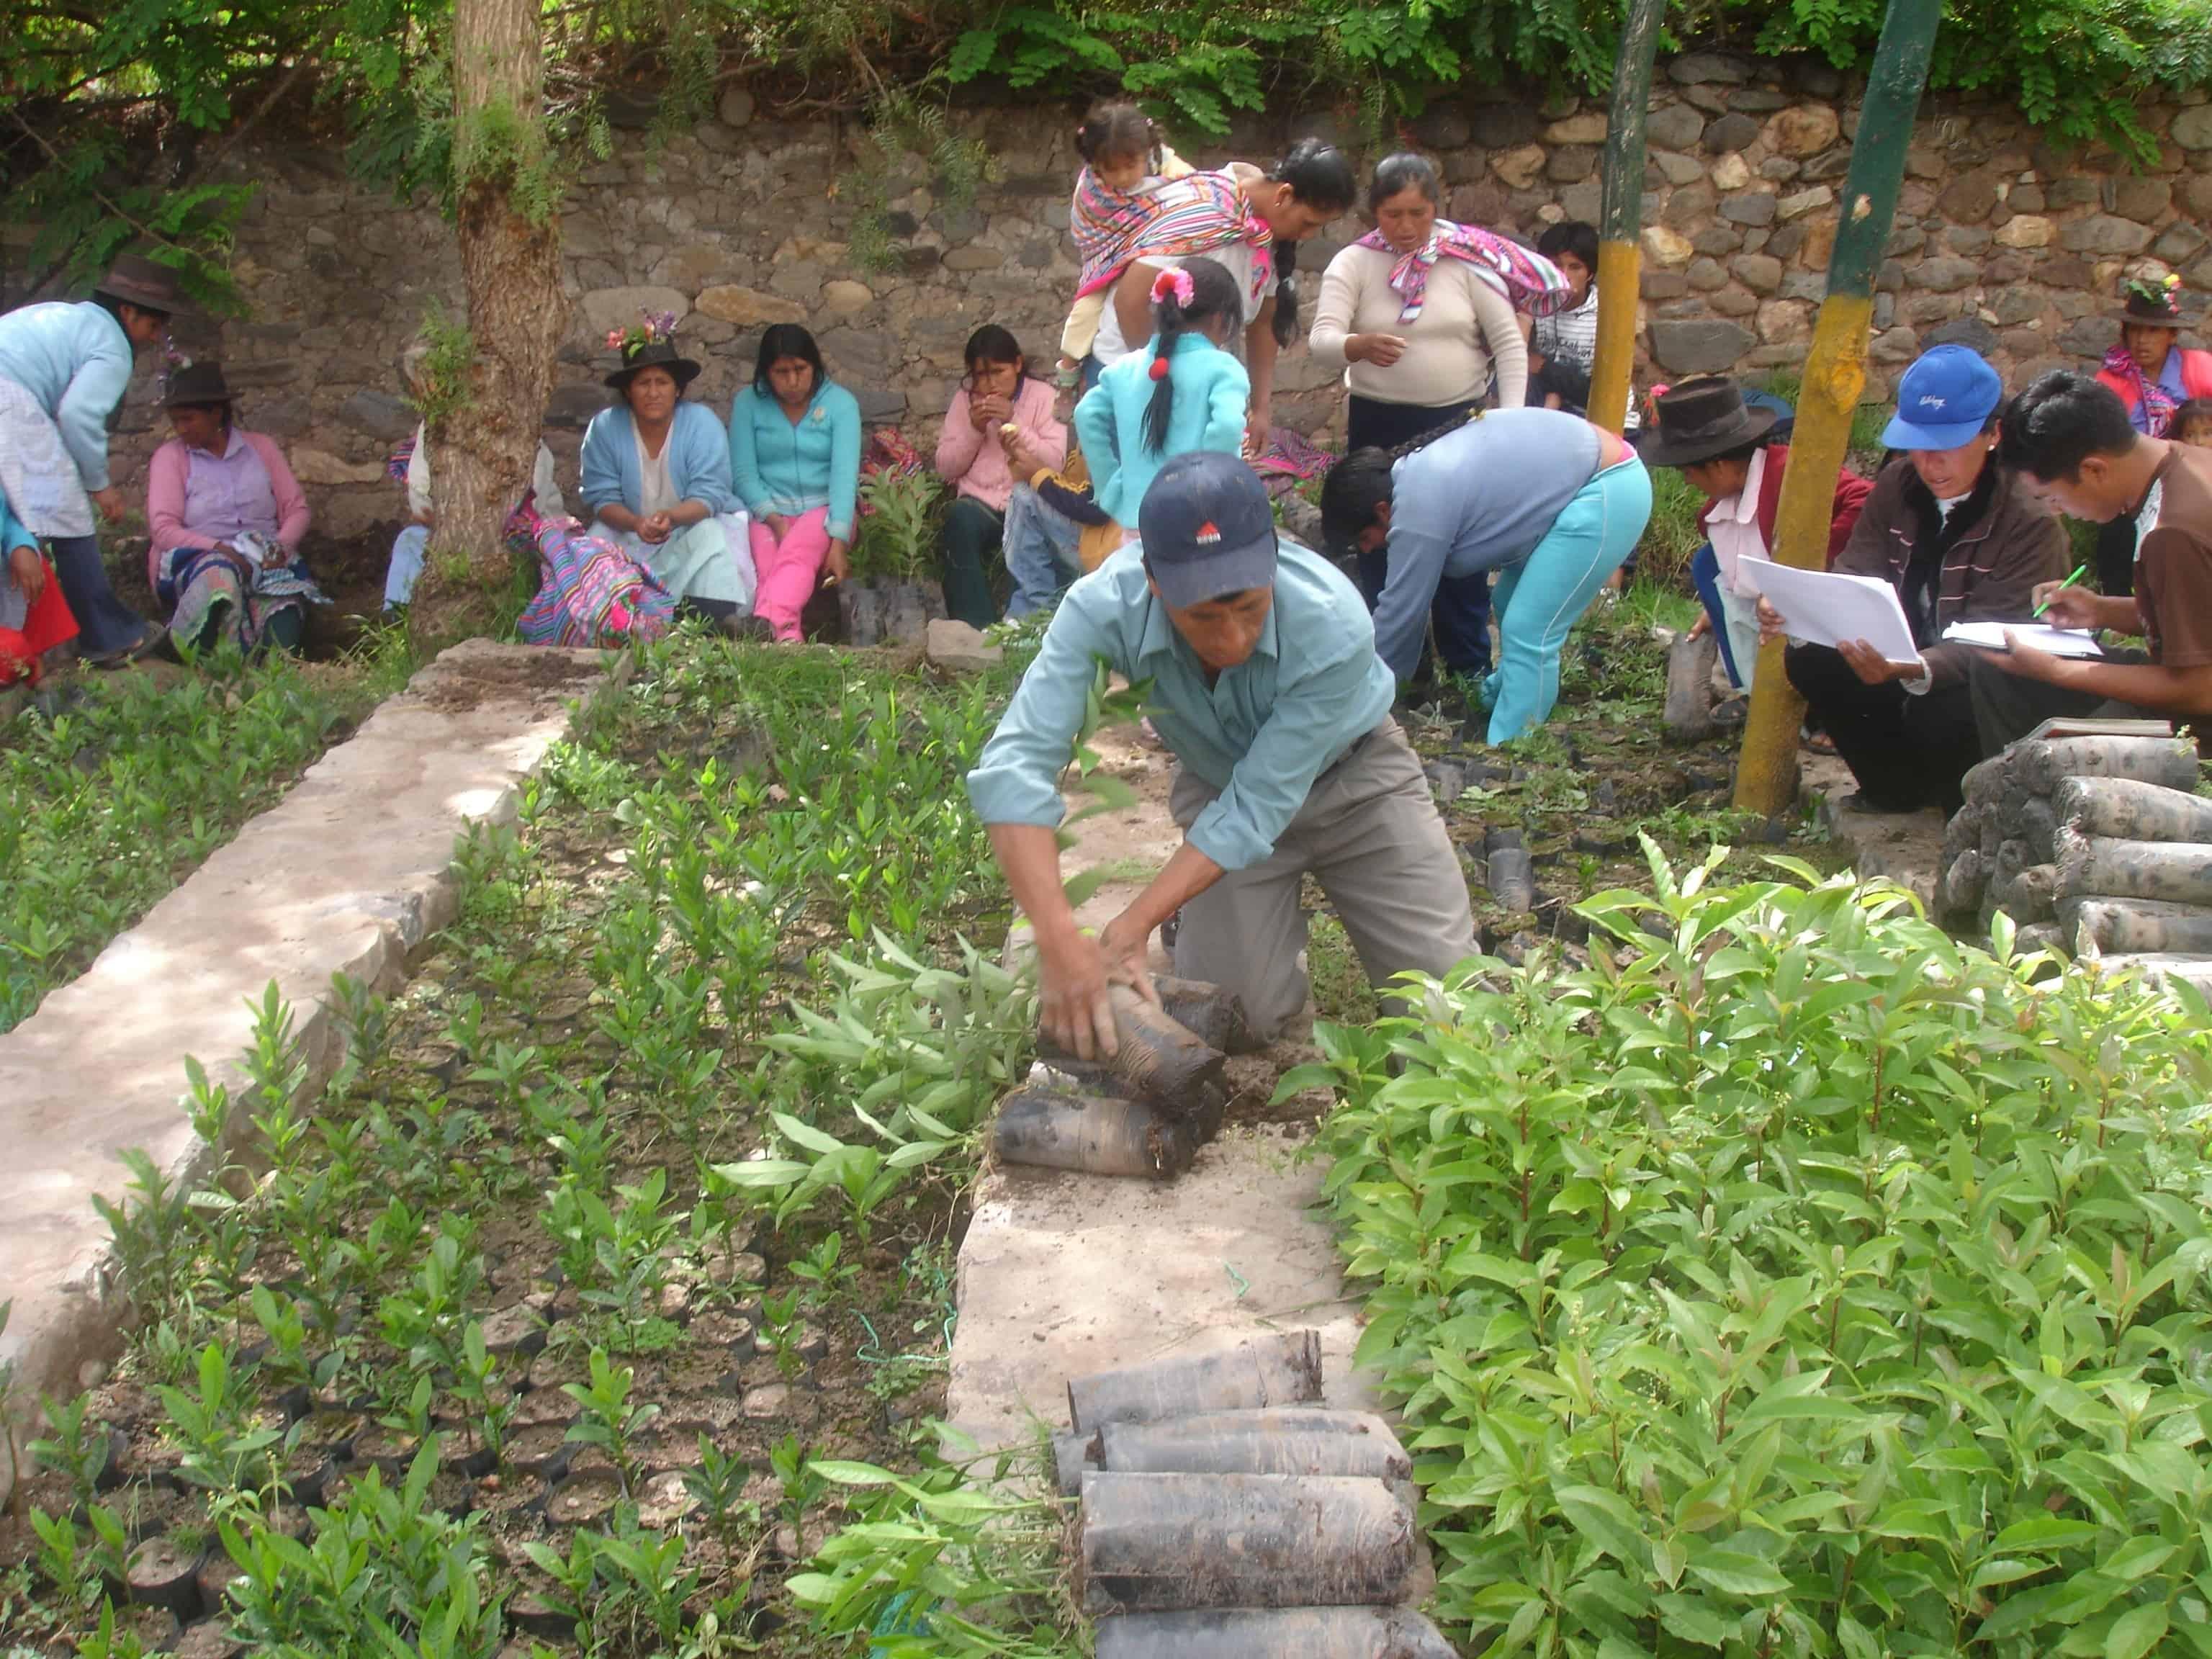 Archive-Peru-Tadepa-5